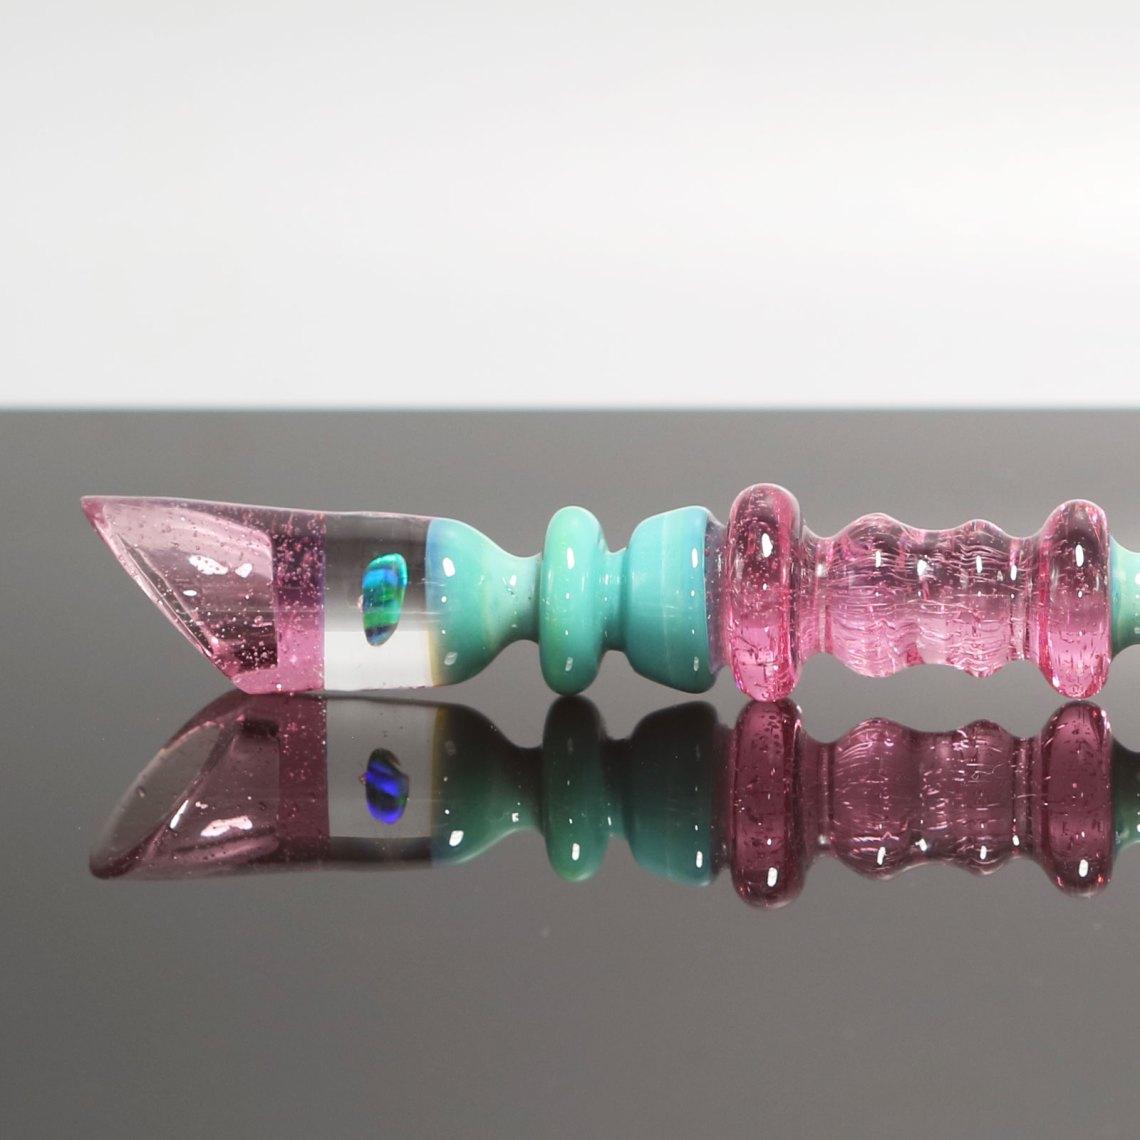 Czar Glass – Silver Aqua Rozay Ultra Scoop